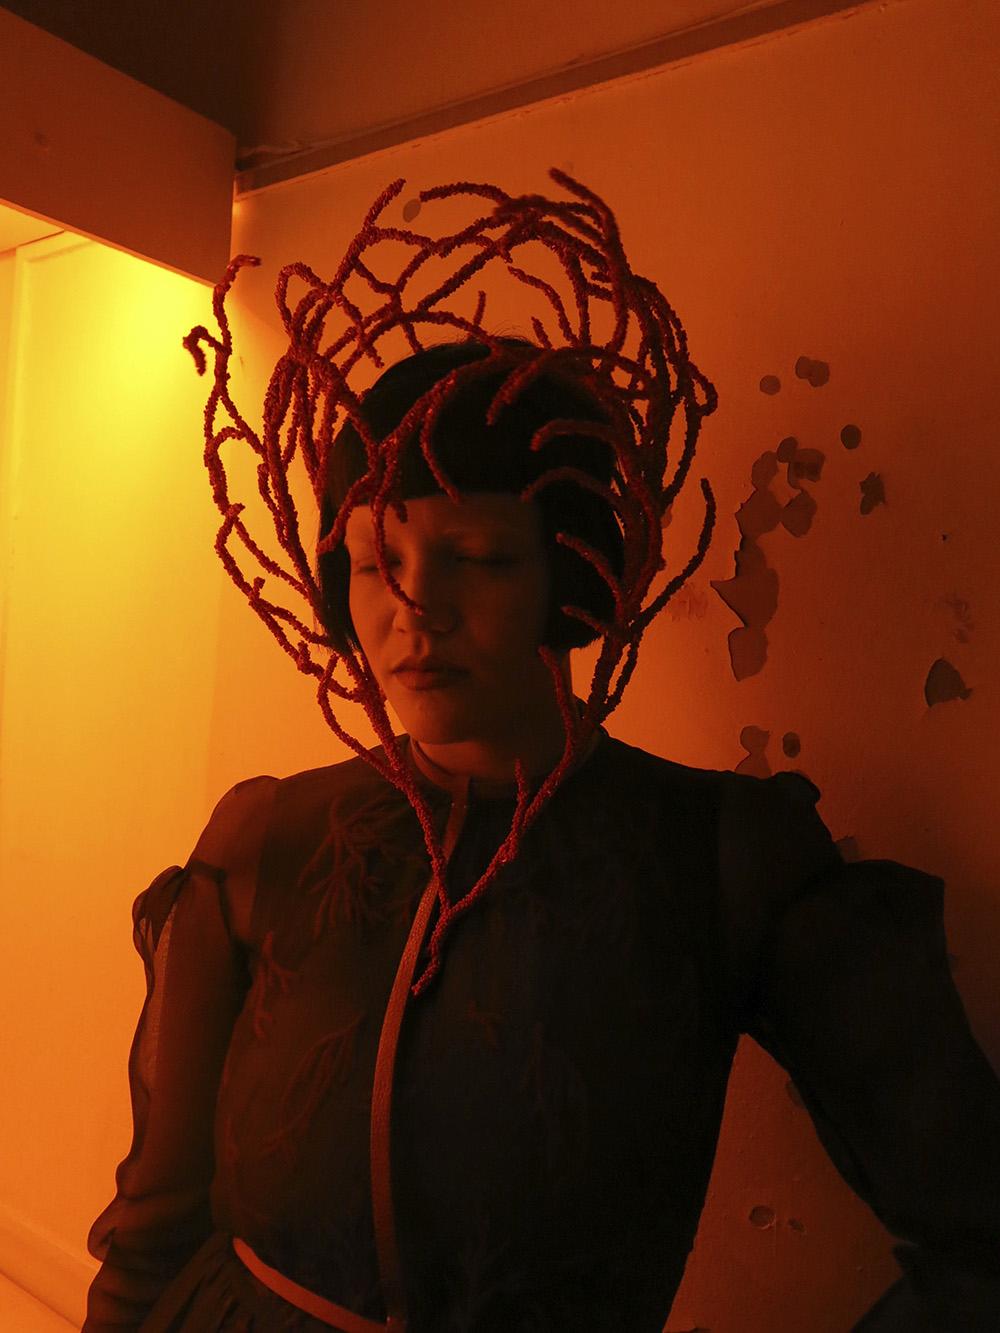 Curious Halloween headwear